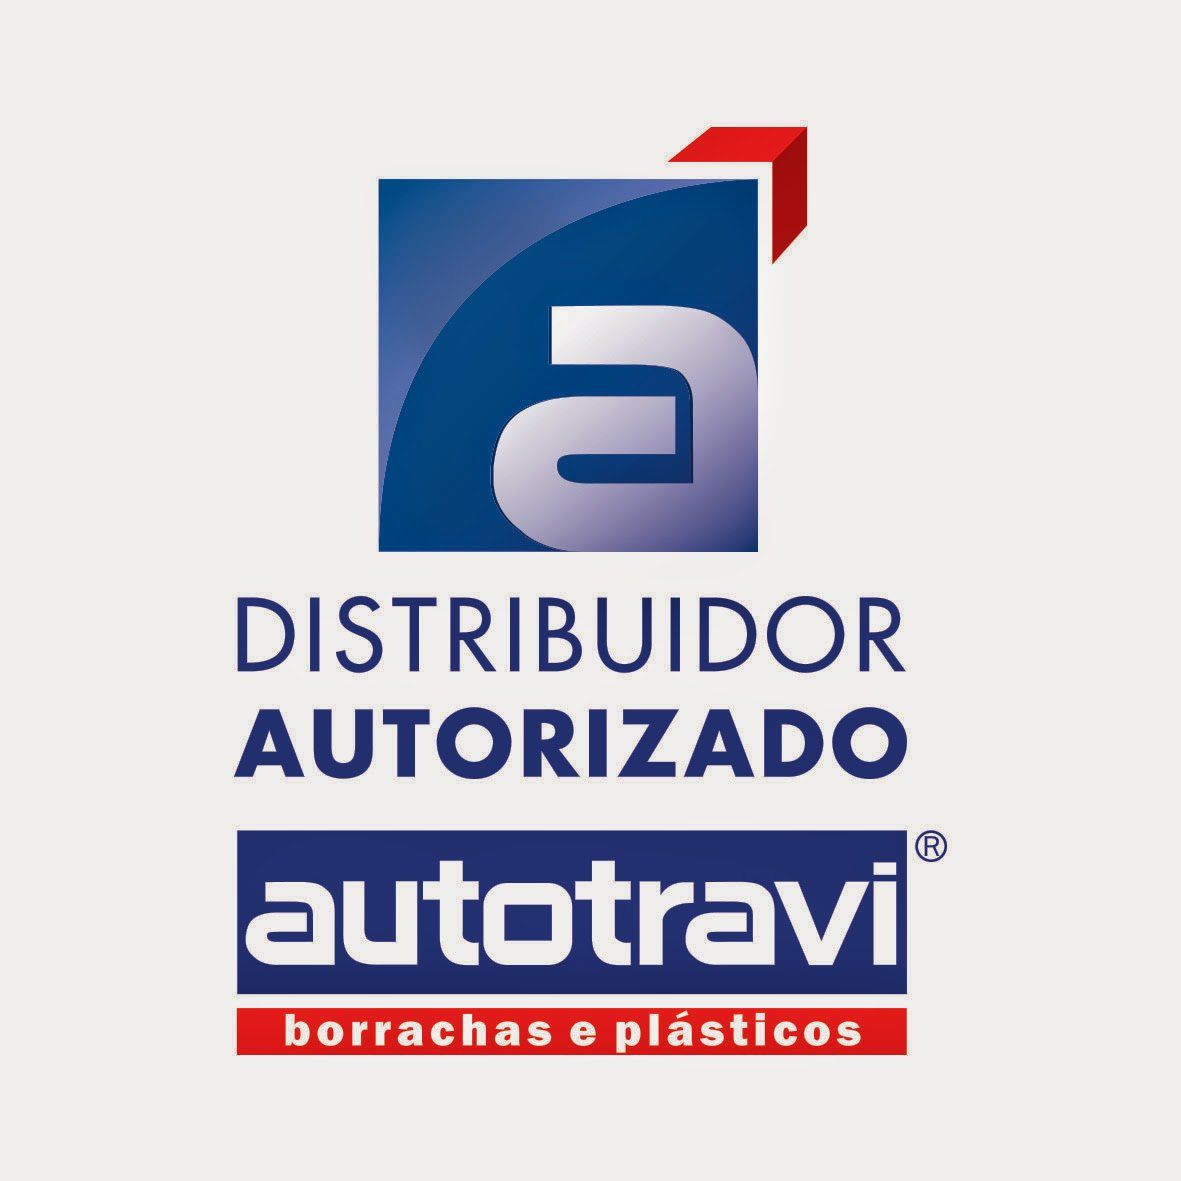 Guarnição Borracha Base Chassis Assoalho VW Fusca Brasília Karmann Ghia  - Marca Autotravi  - Bunnitu Peças e Acessórios